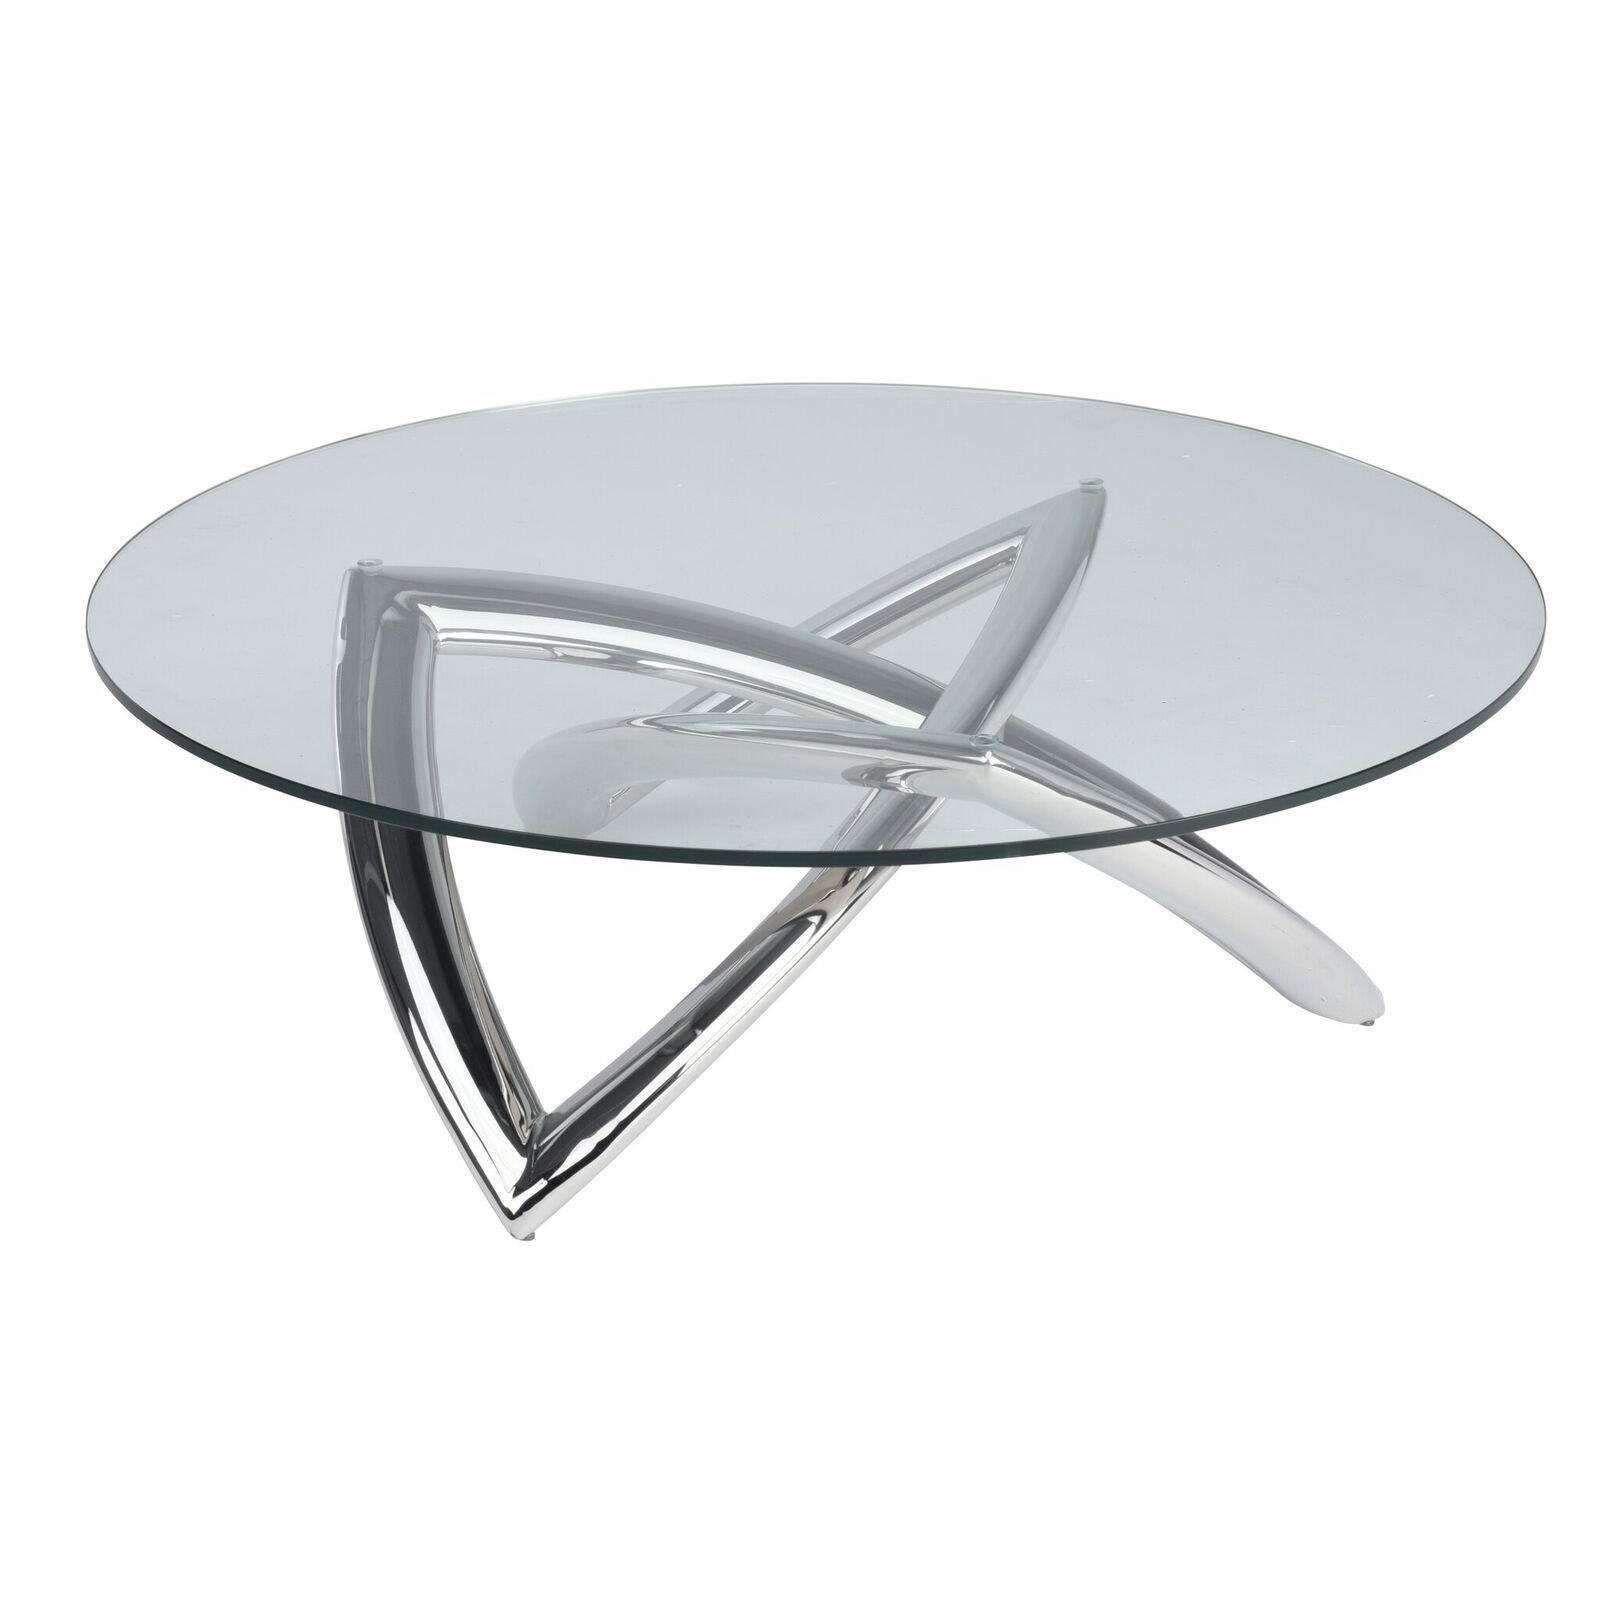 Martina Coffee Tablesilver In 2021 Coffee Table Modern Coffee Tables Gold Coffee Table [ 1600 x 1600 Pixel ]